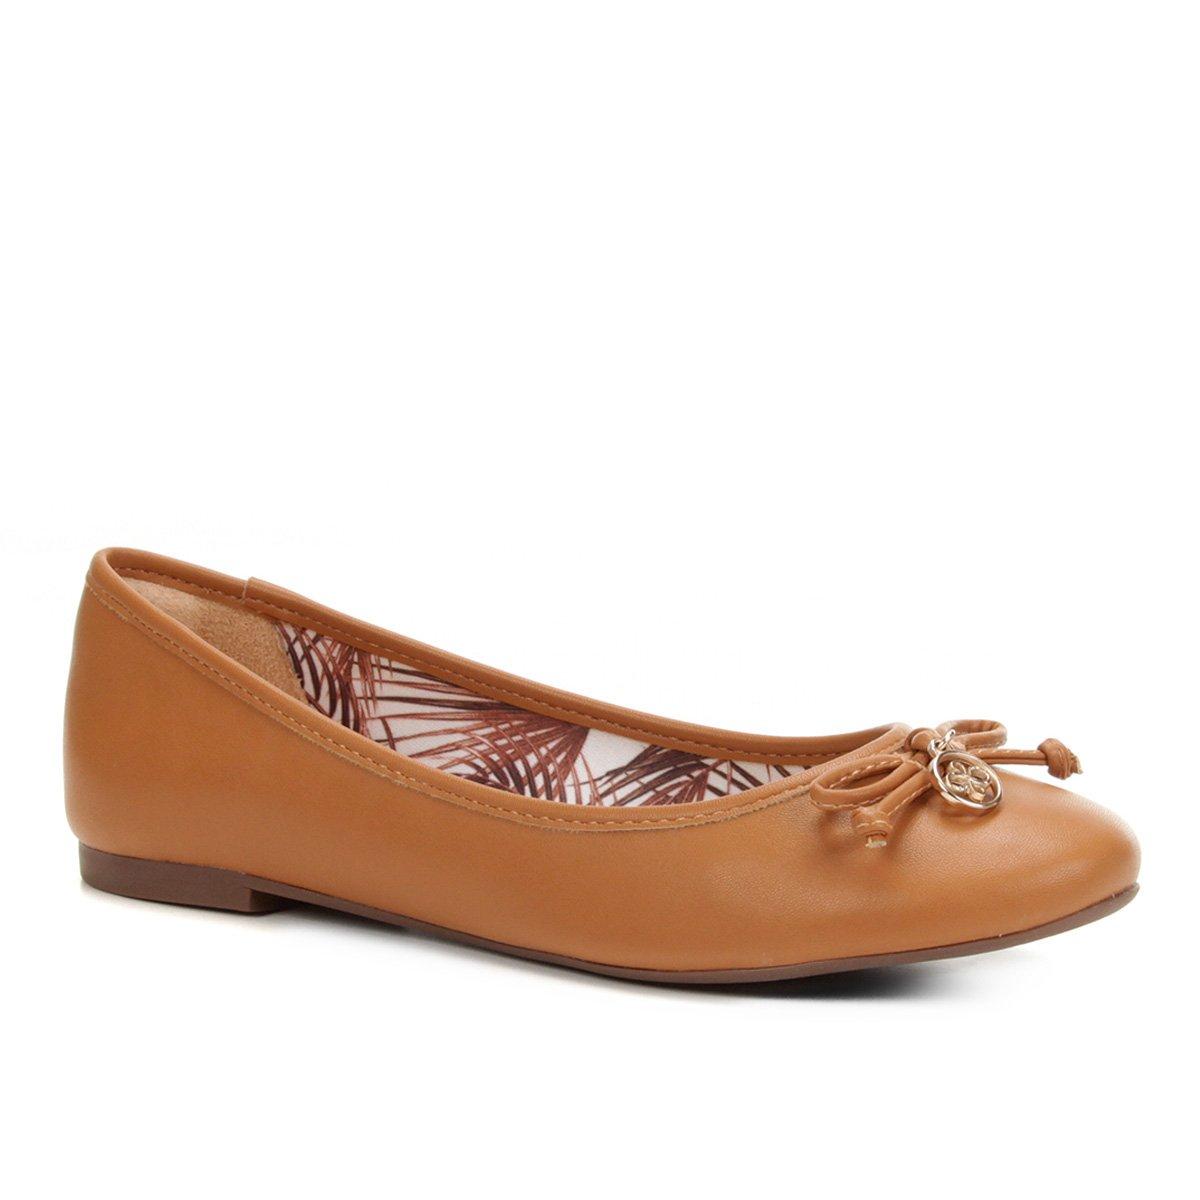 36a5e8ae1 Sapatilha Shoestock Bico Redondo Medalha Feminina | Shoestock